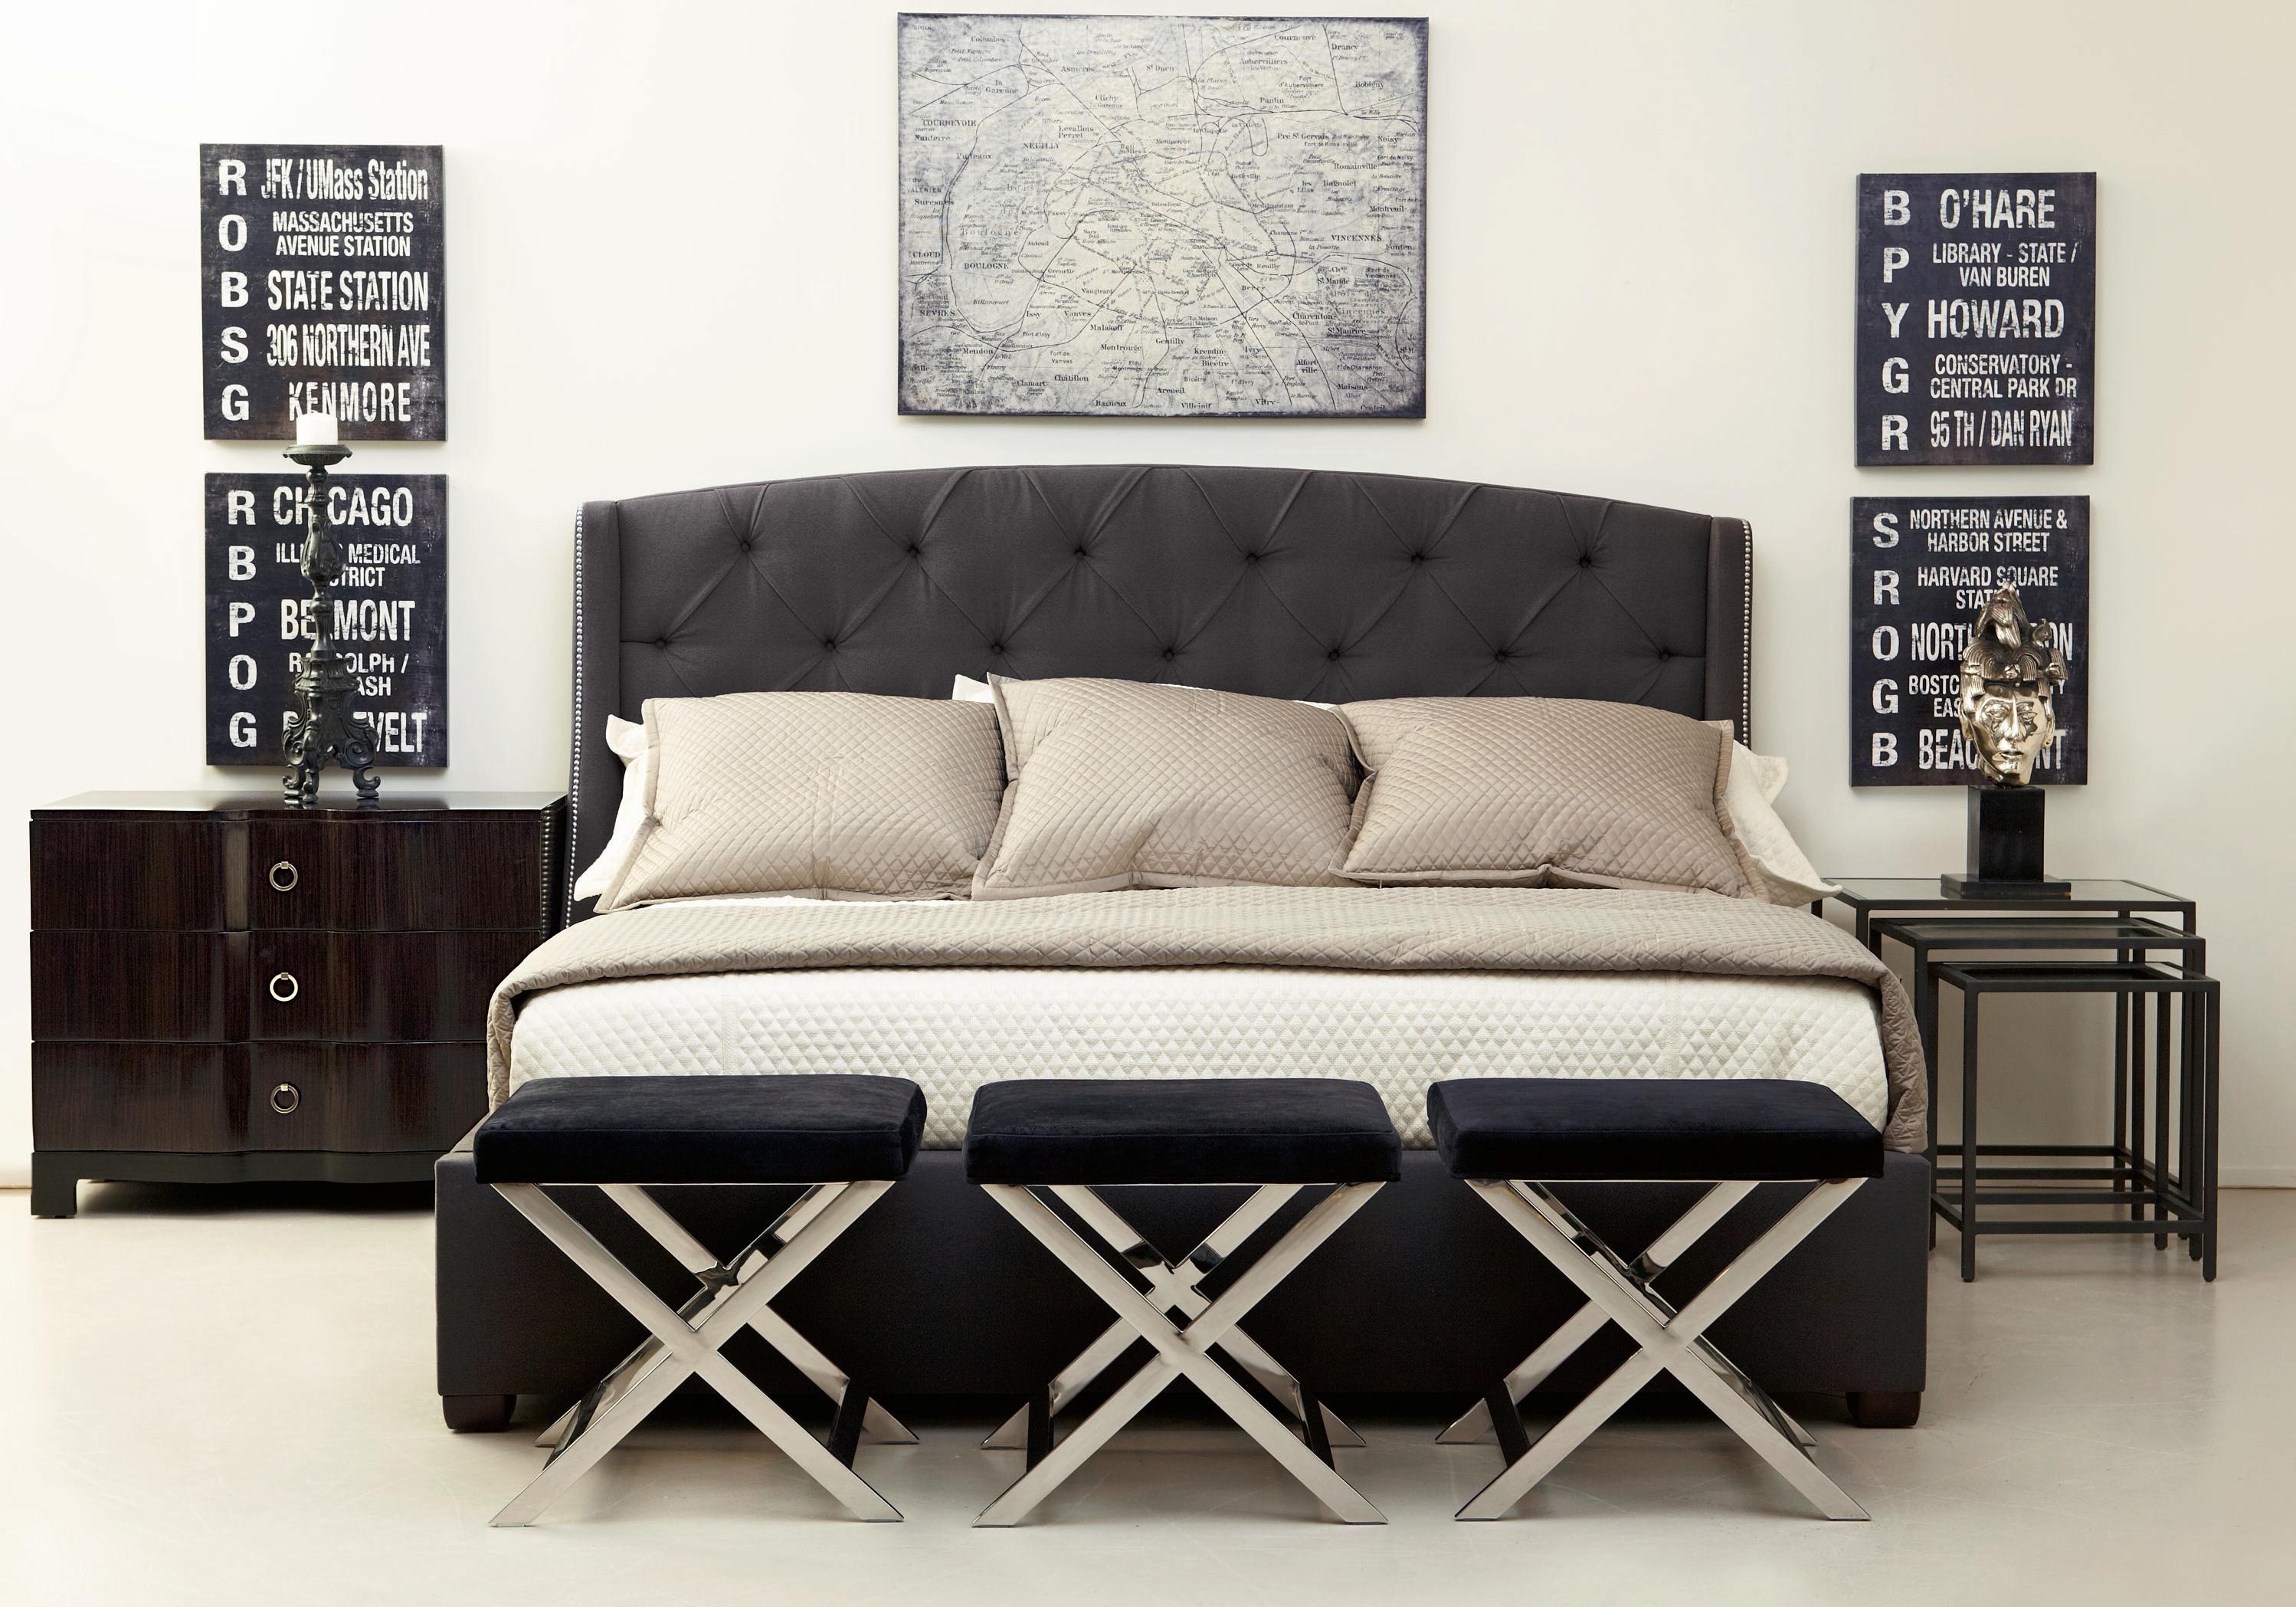 Seldens Designer Home Furnishings In Tacoma Wa 98424